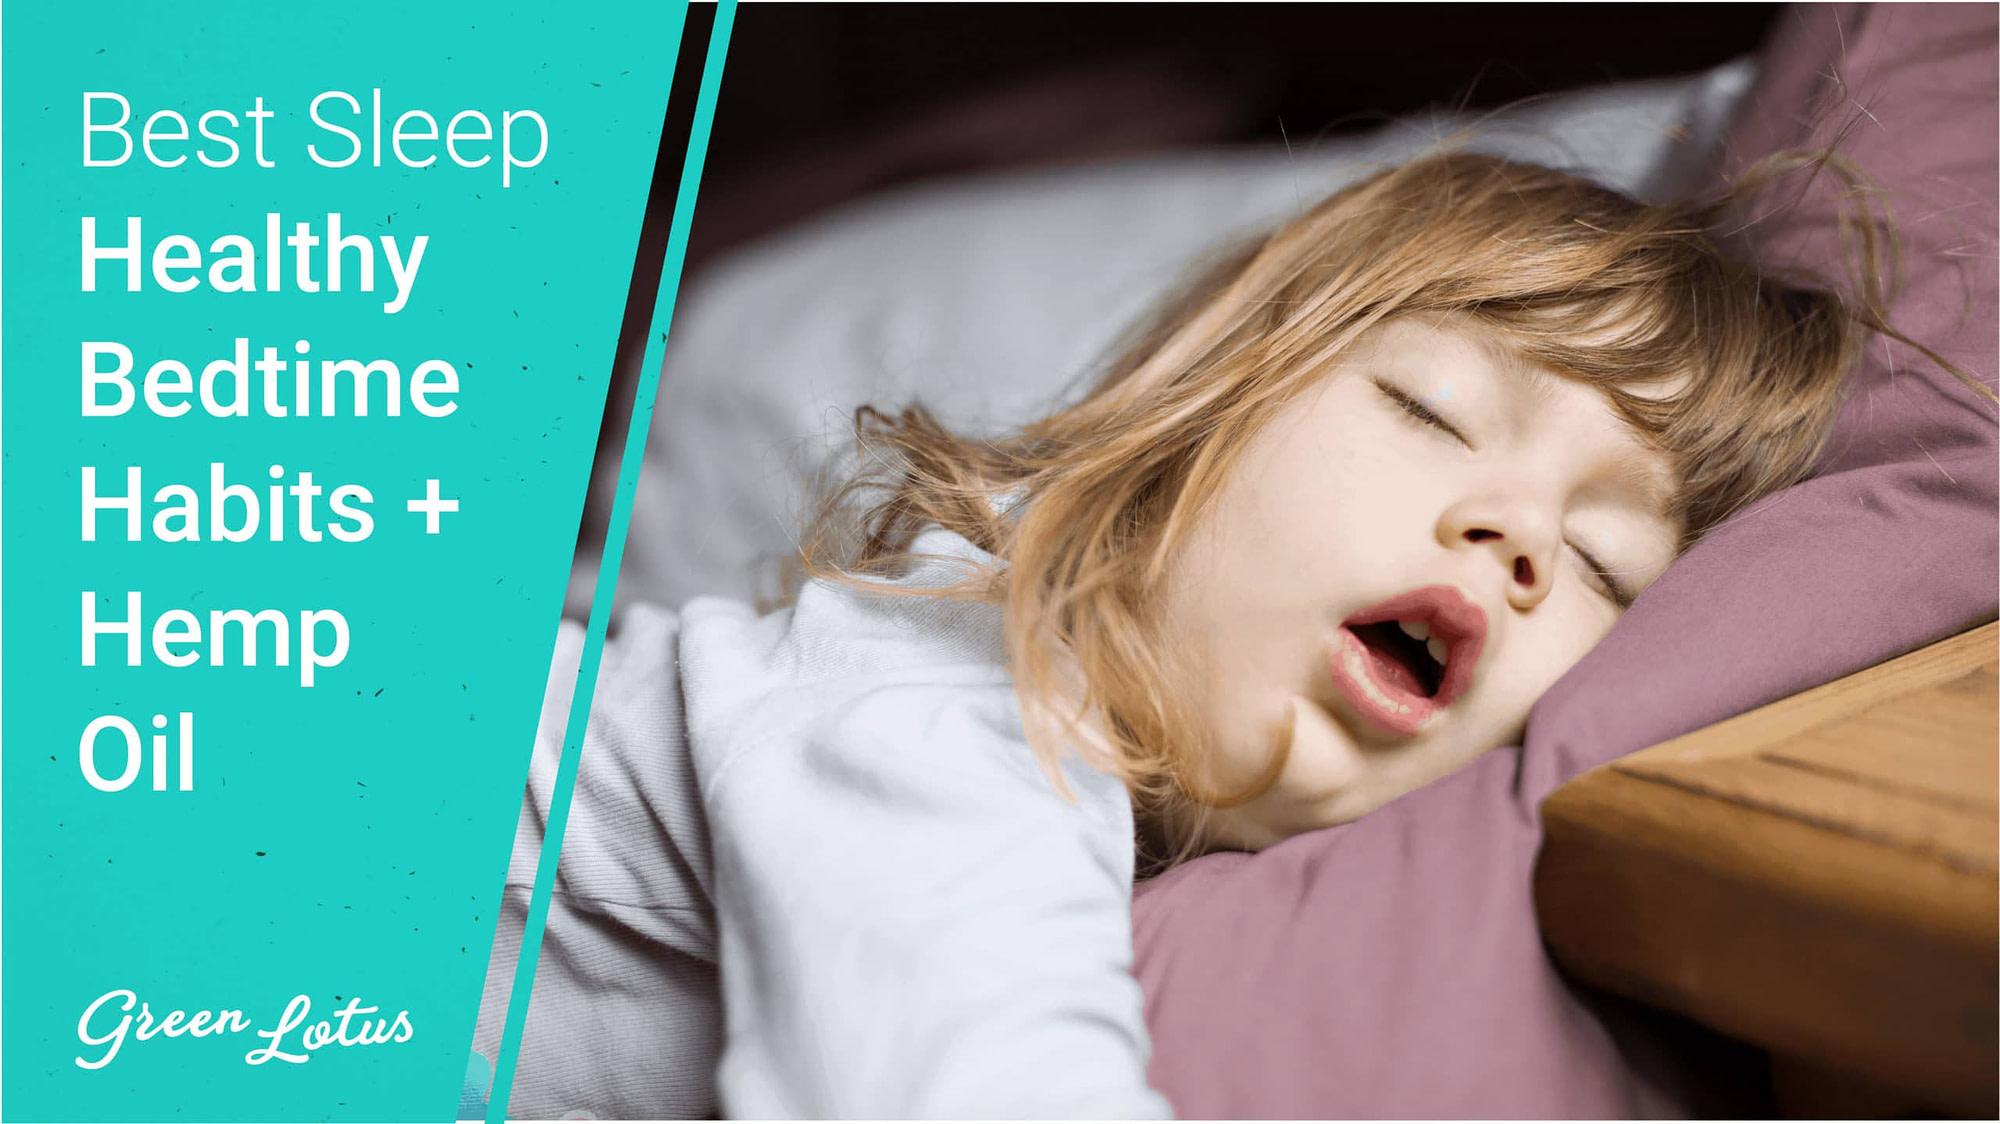 Get Your Best Sleep: Healthy bedtime habits + CBD oil for sleep